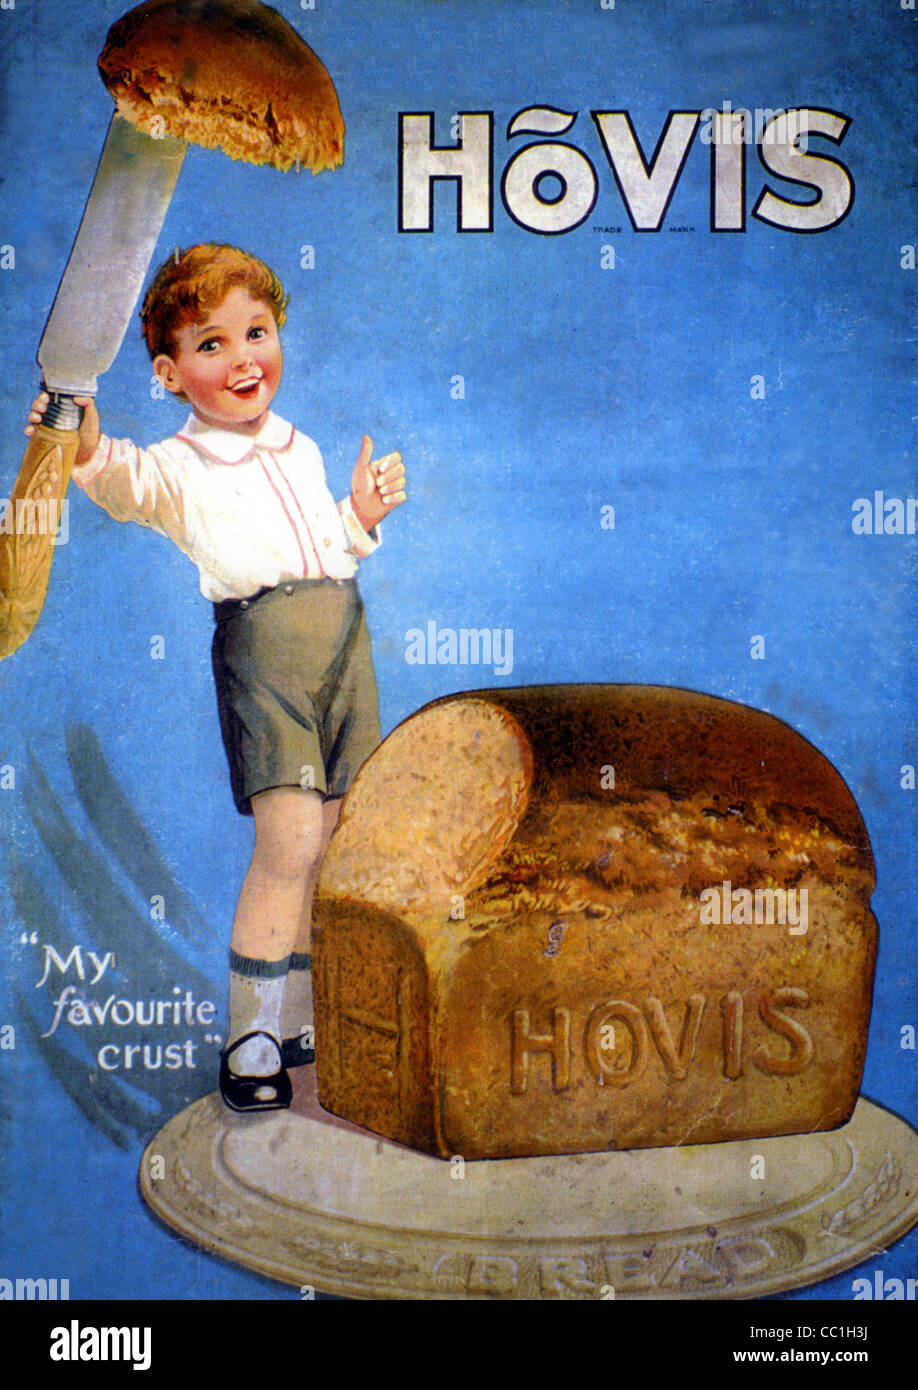 HOVIS BREAD ADVERT 1925 - Stock Image